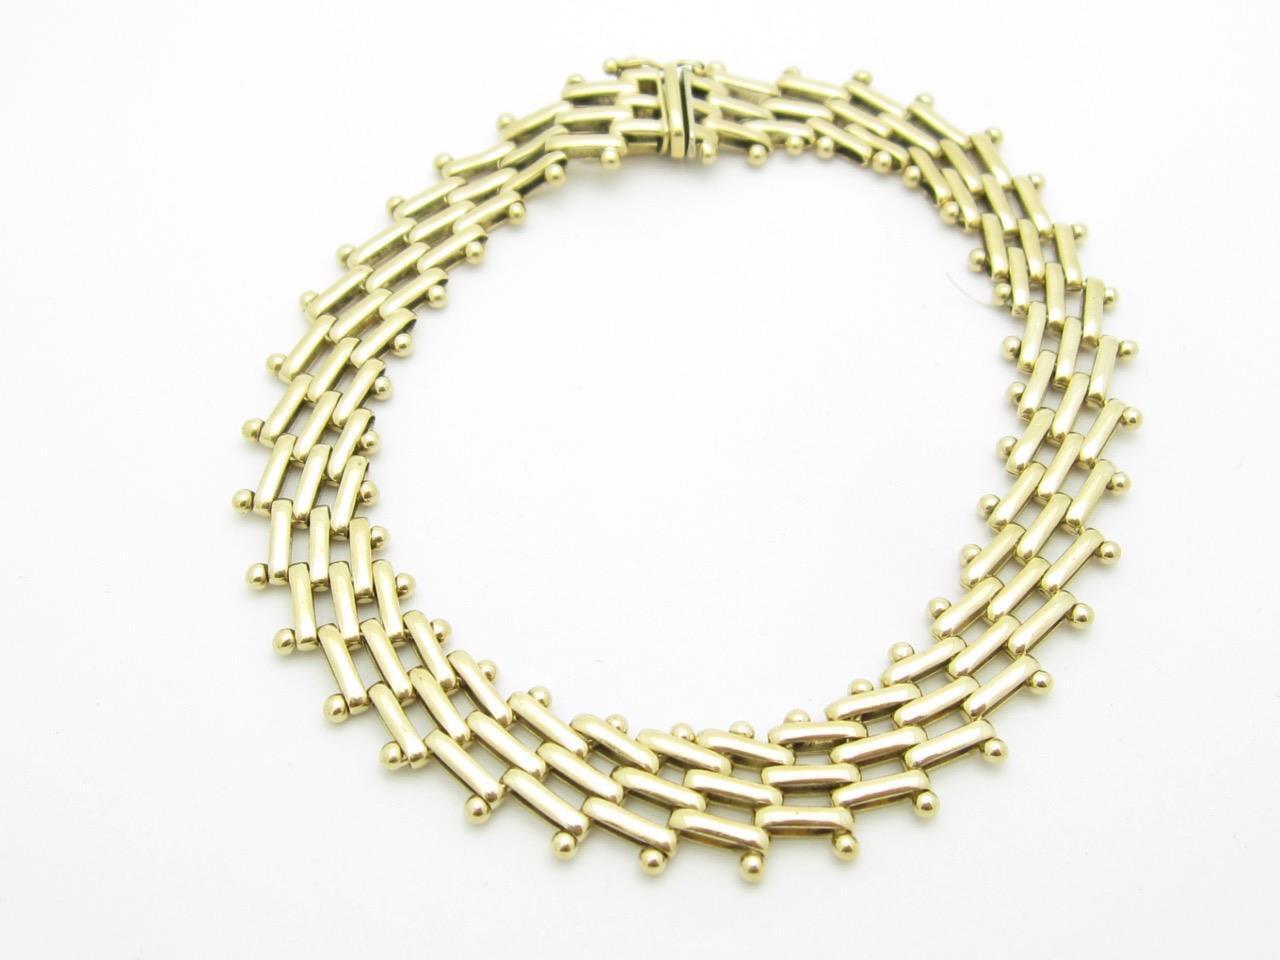 14k Yellow gold Basket Weave Chain Design 8  Length Wide Bracelet 18.0 Grams